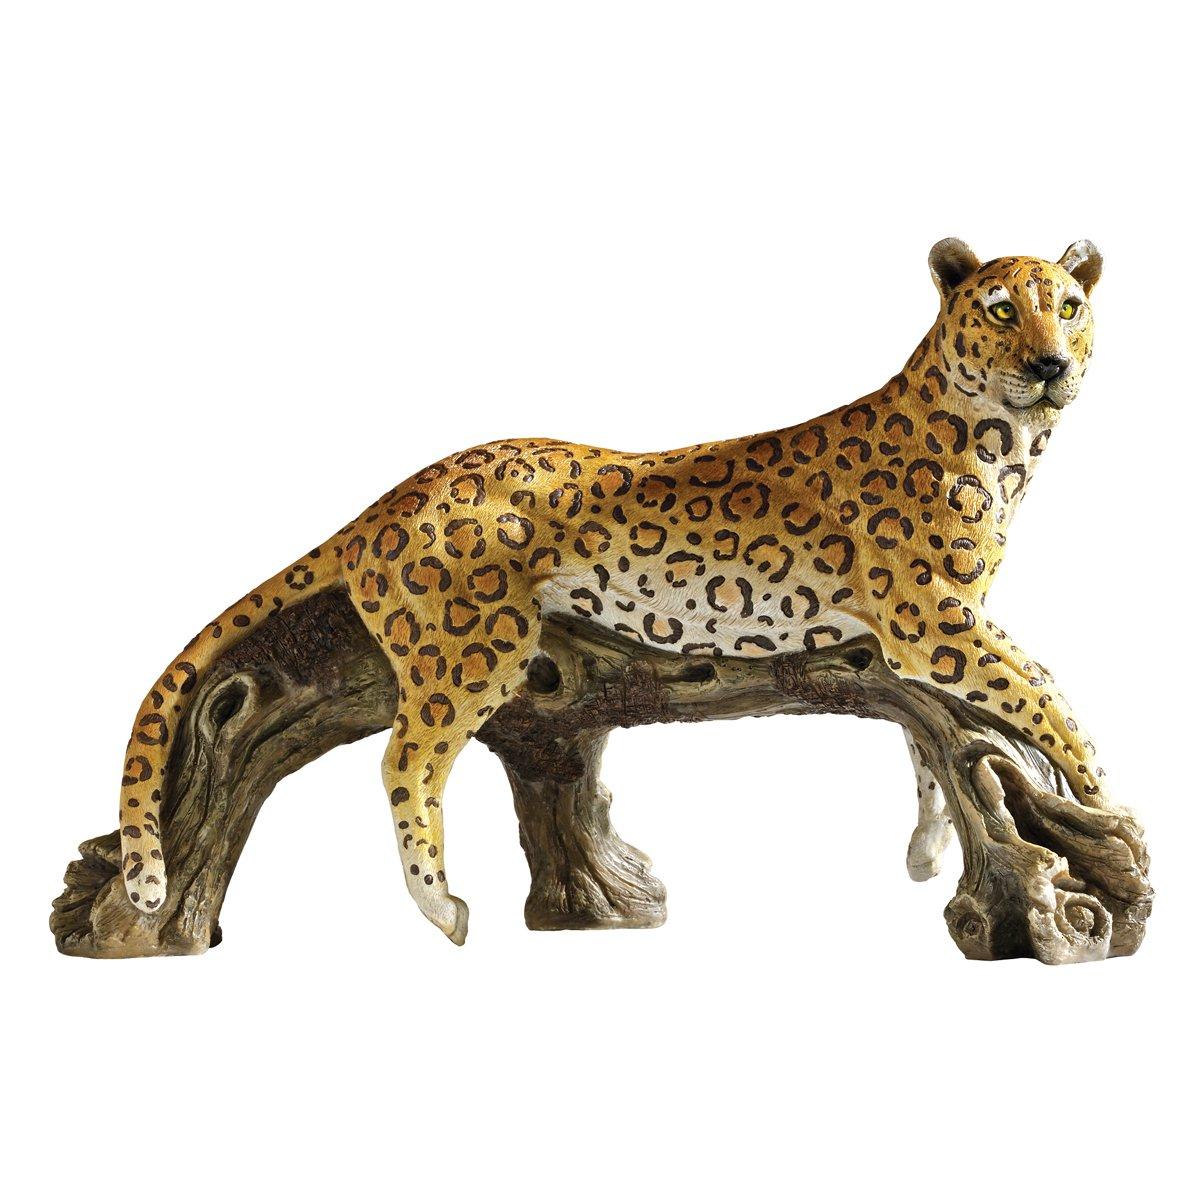 Amazon.com : Design Toscano Leopardu0027s Kingdom Garden Statue : Outdoor  Statues : Garden U0026 Outdoor